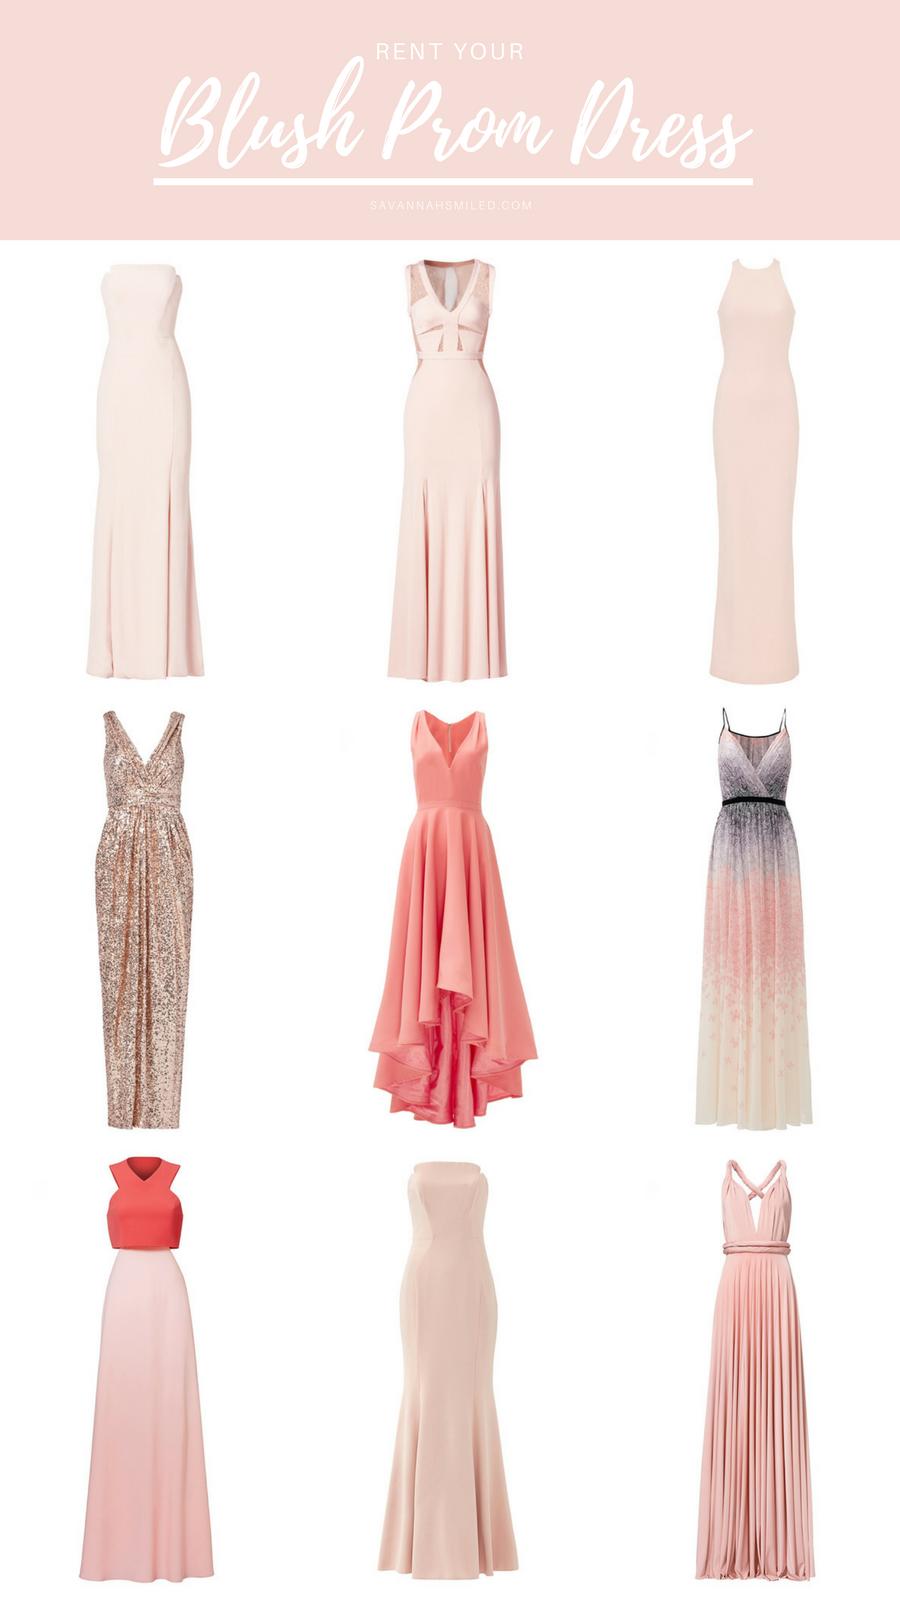 Rent The Blush Prom Dress — Savannah SMILED